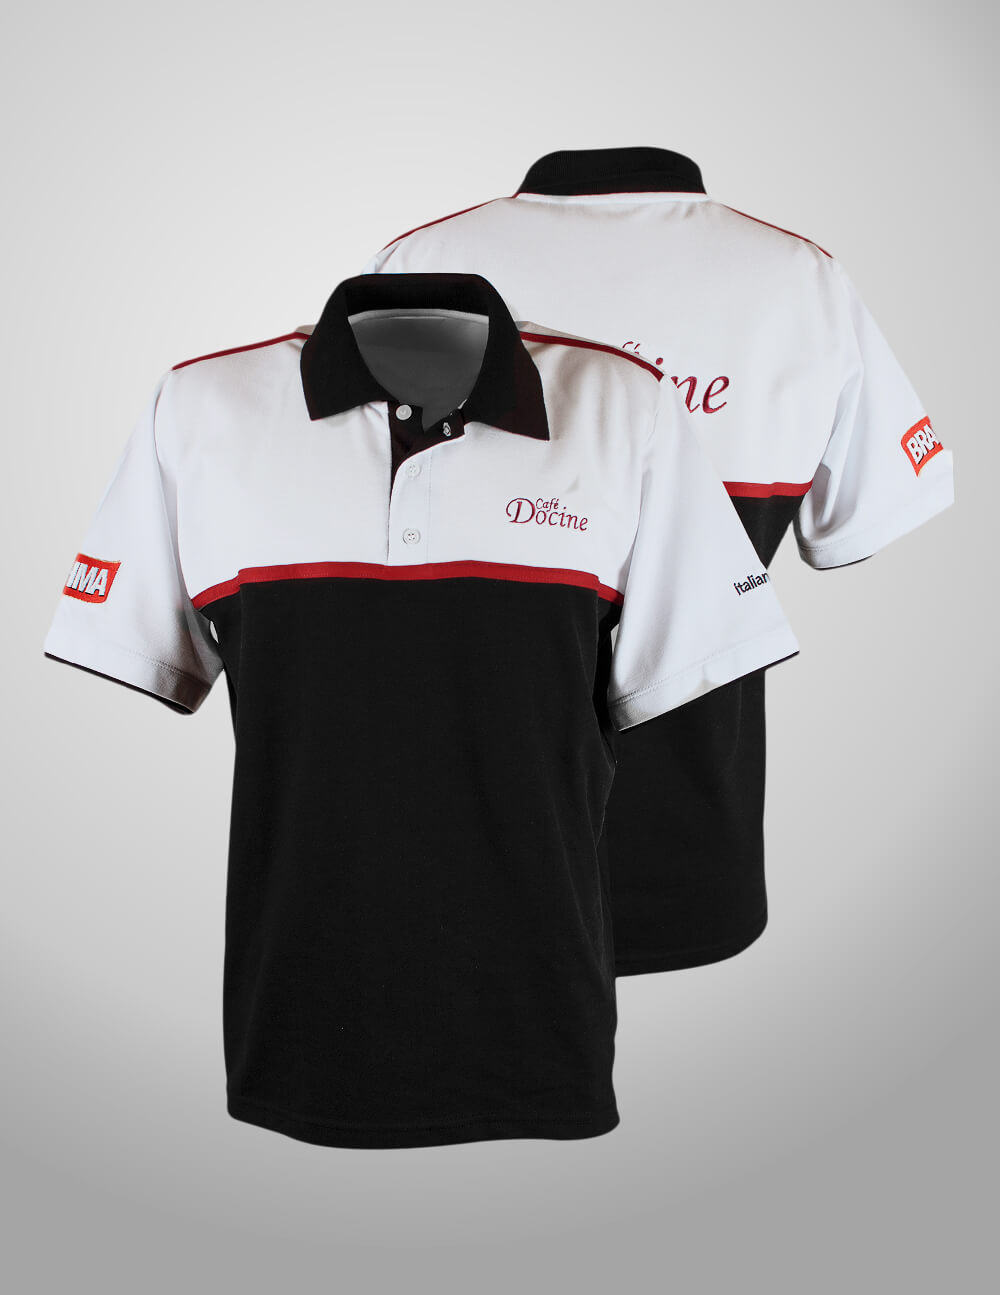 c8e195717a Uniformes Campagna – Camisa Polo